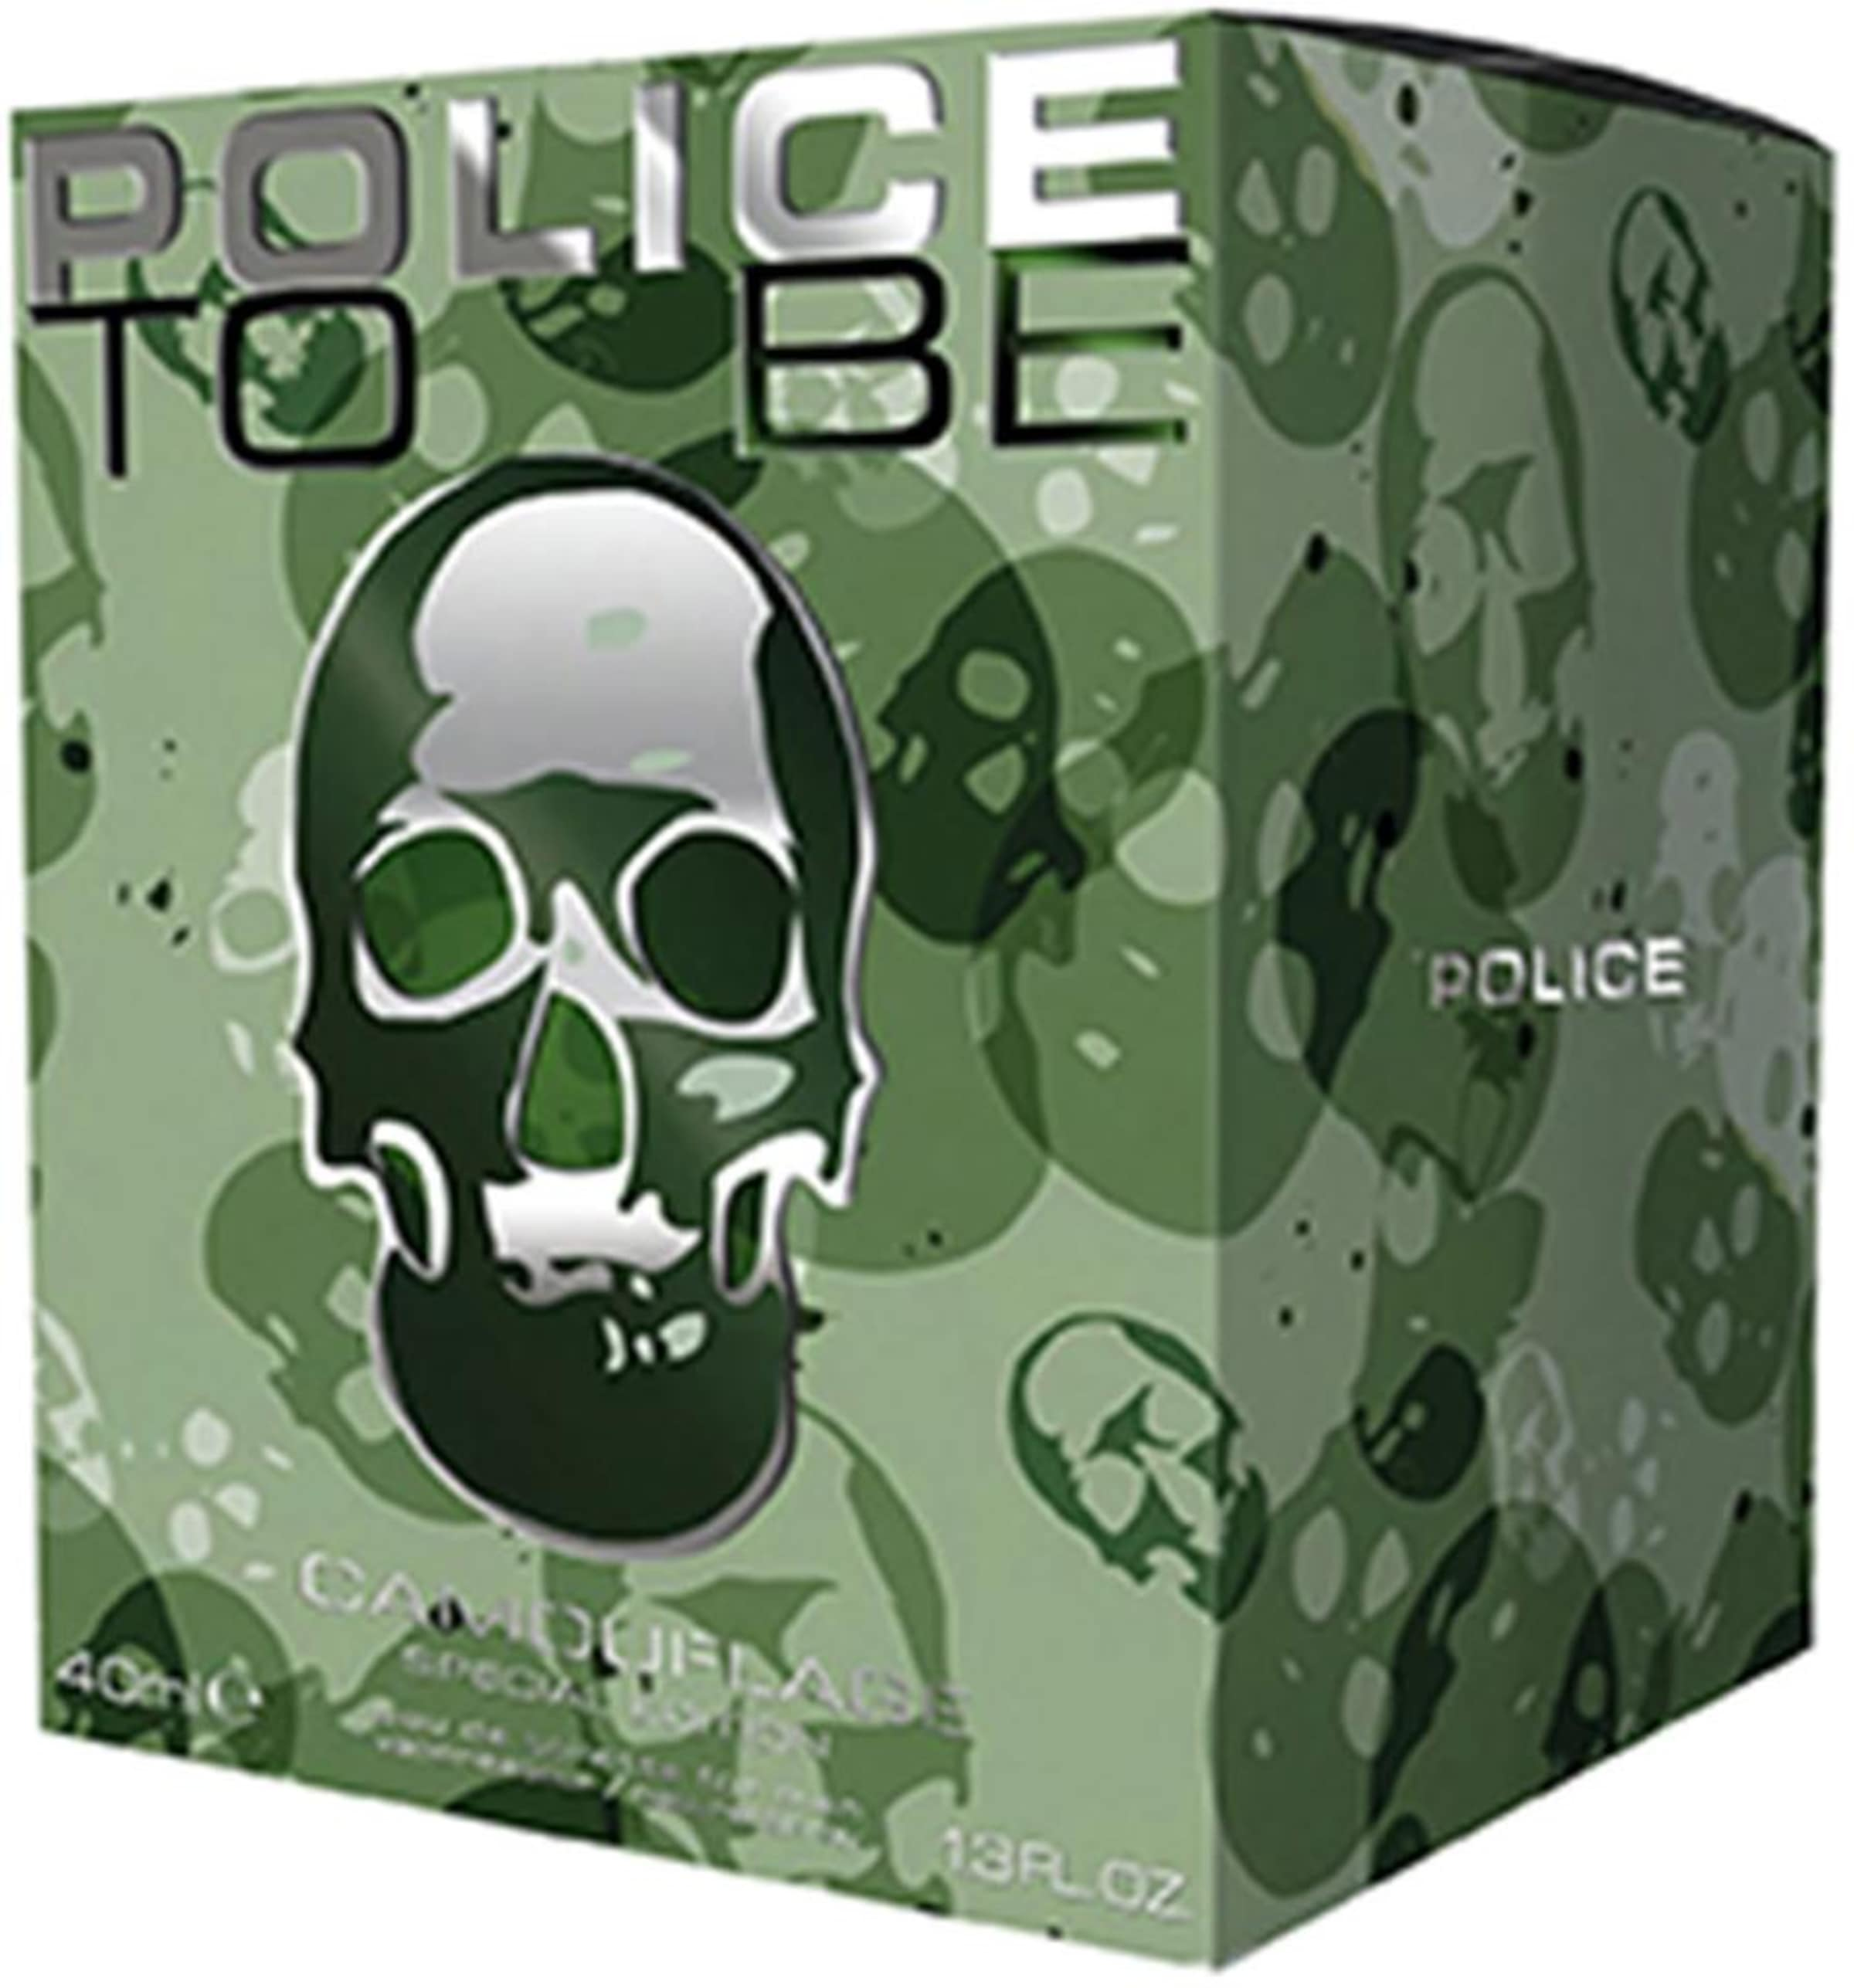 Grasgrün De Toilette Police Camouflage' Eau 'to Be In UVSpqzMG